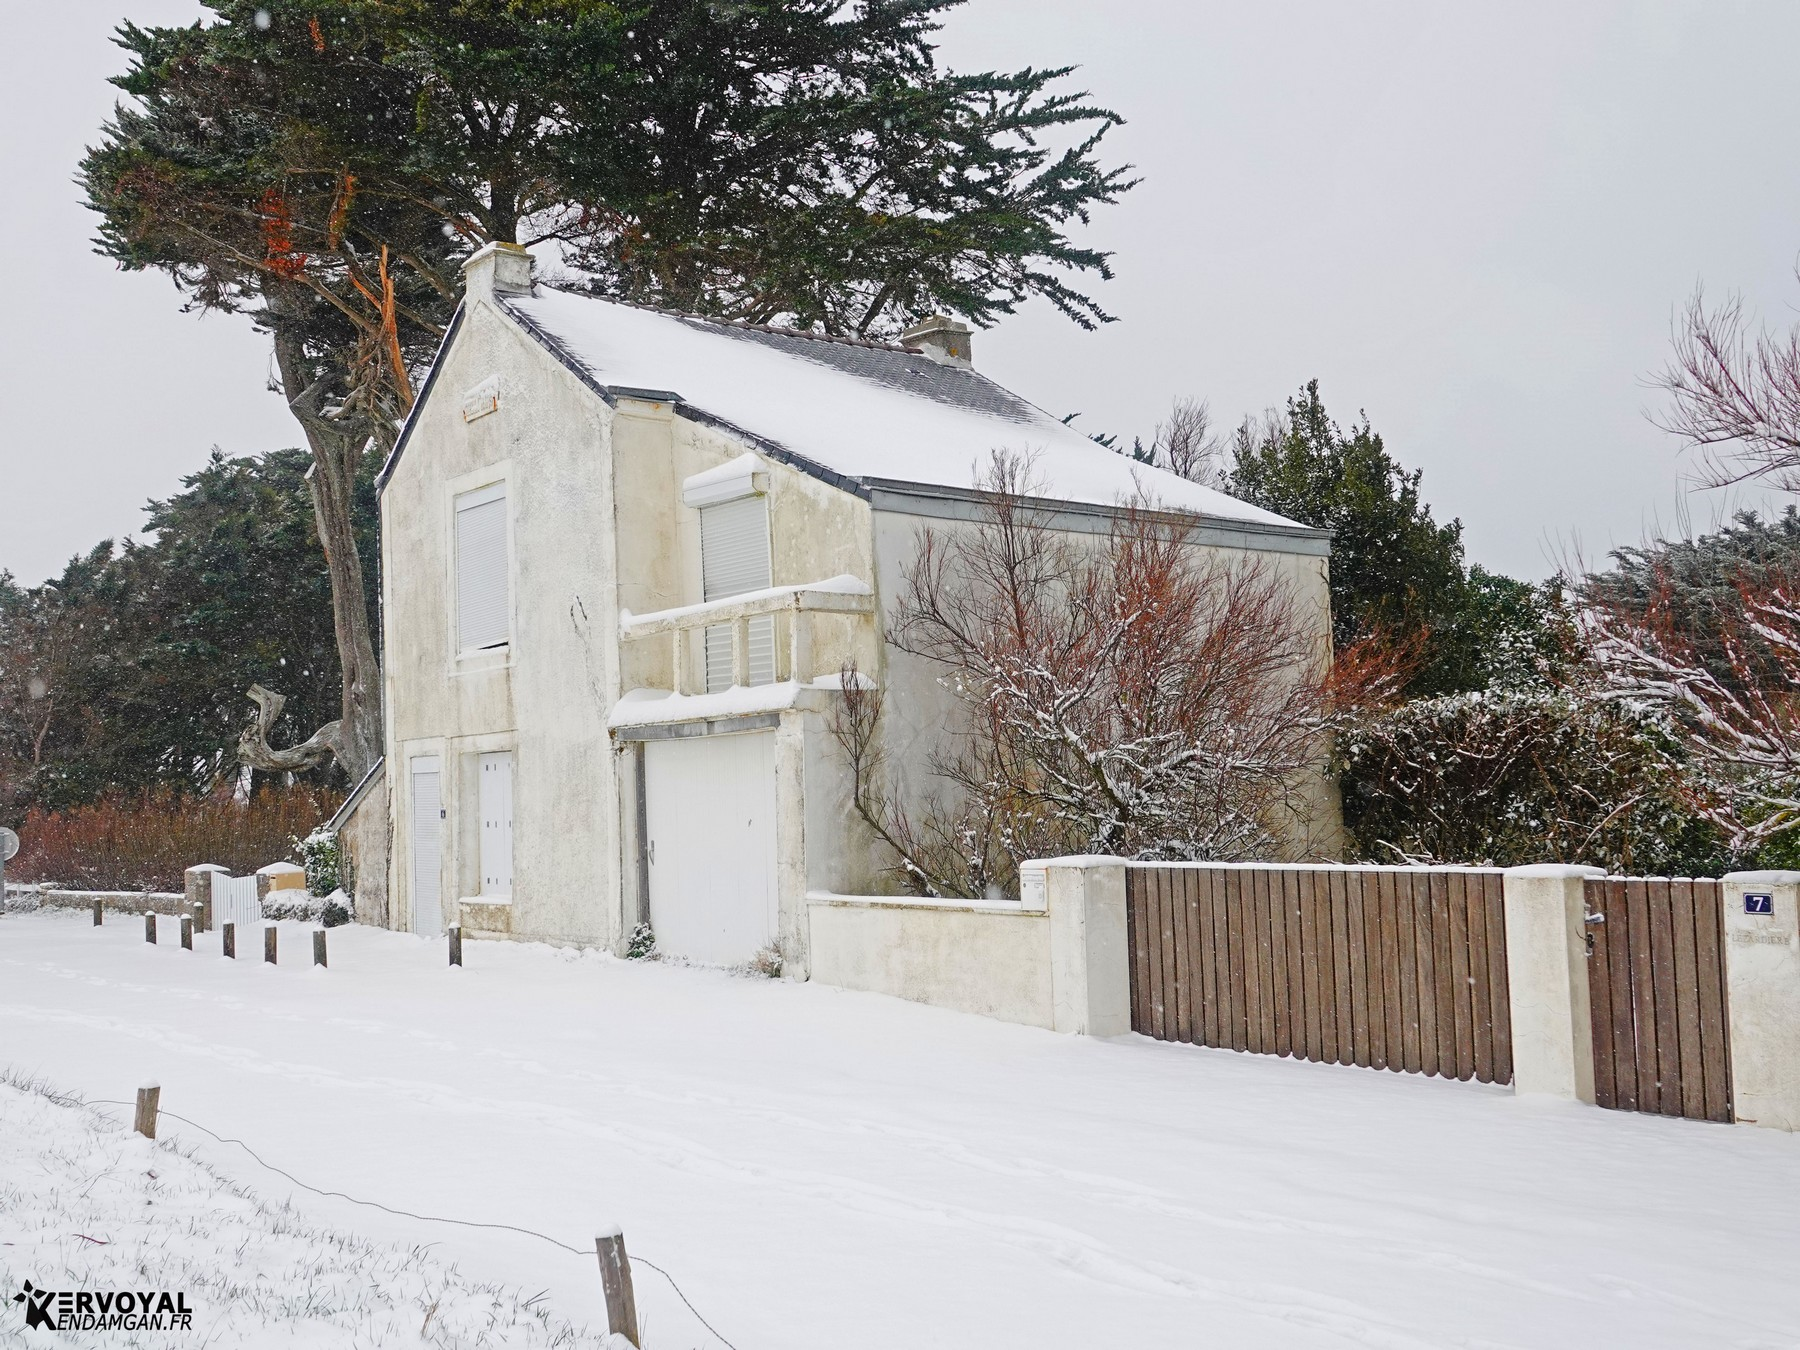 neige à kervoyal 11 février 2021 damgan morbihan (4)